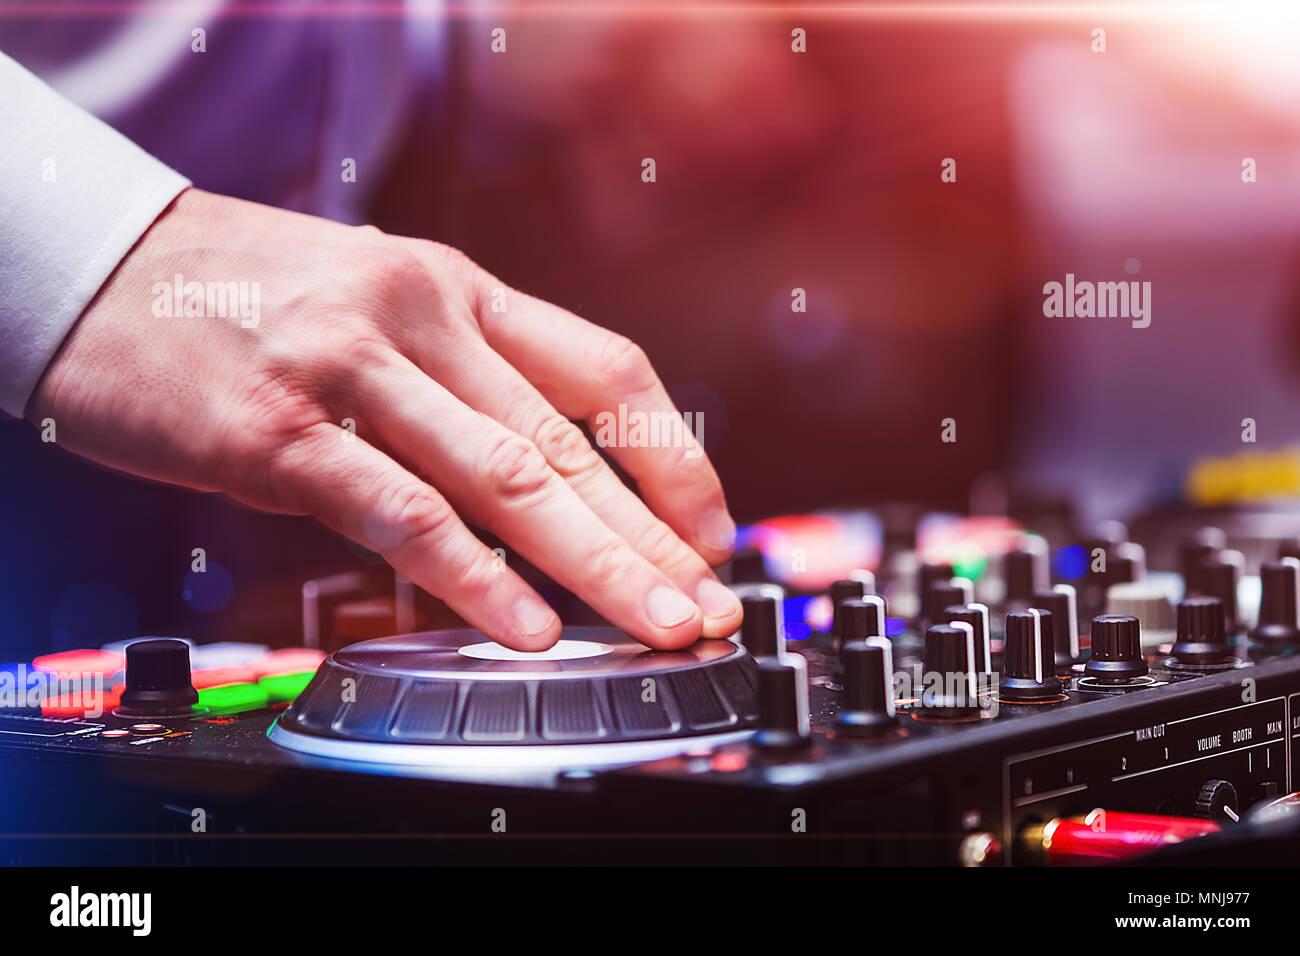 Disk jockey playing music at dj controller - Stock Image